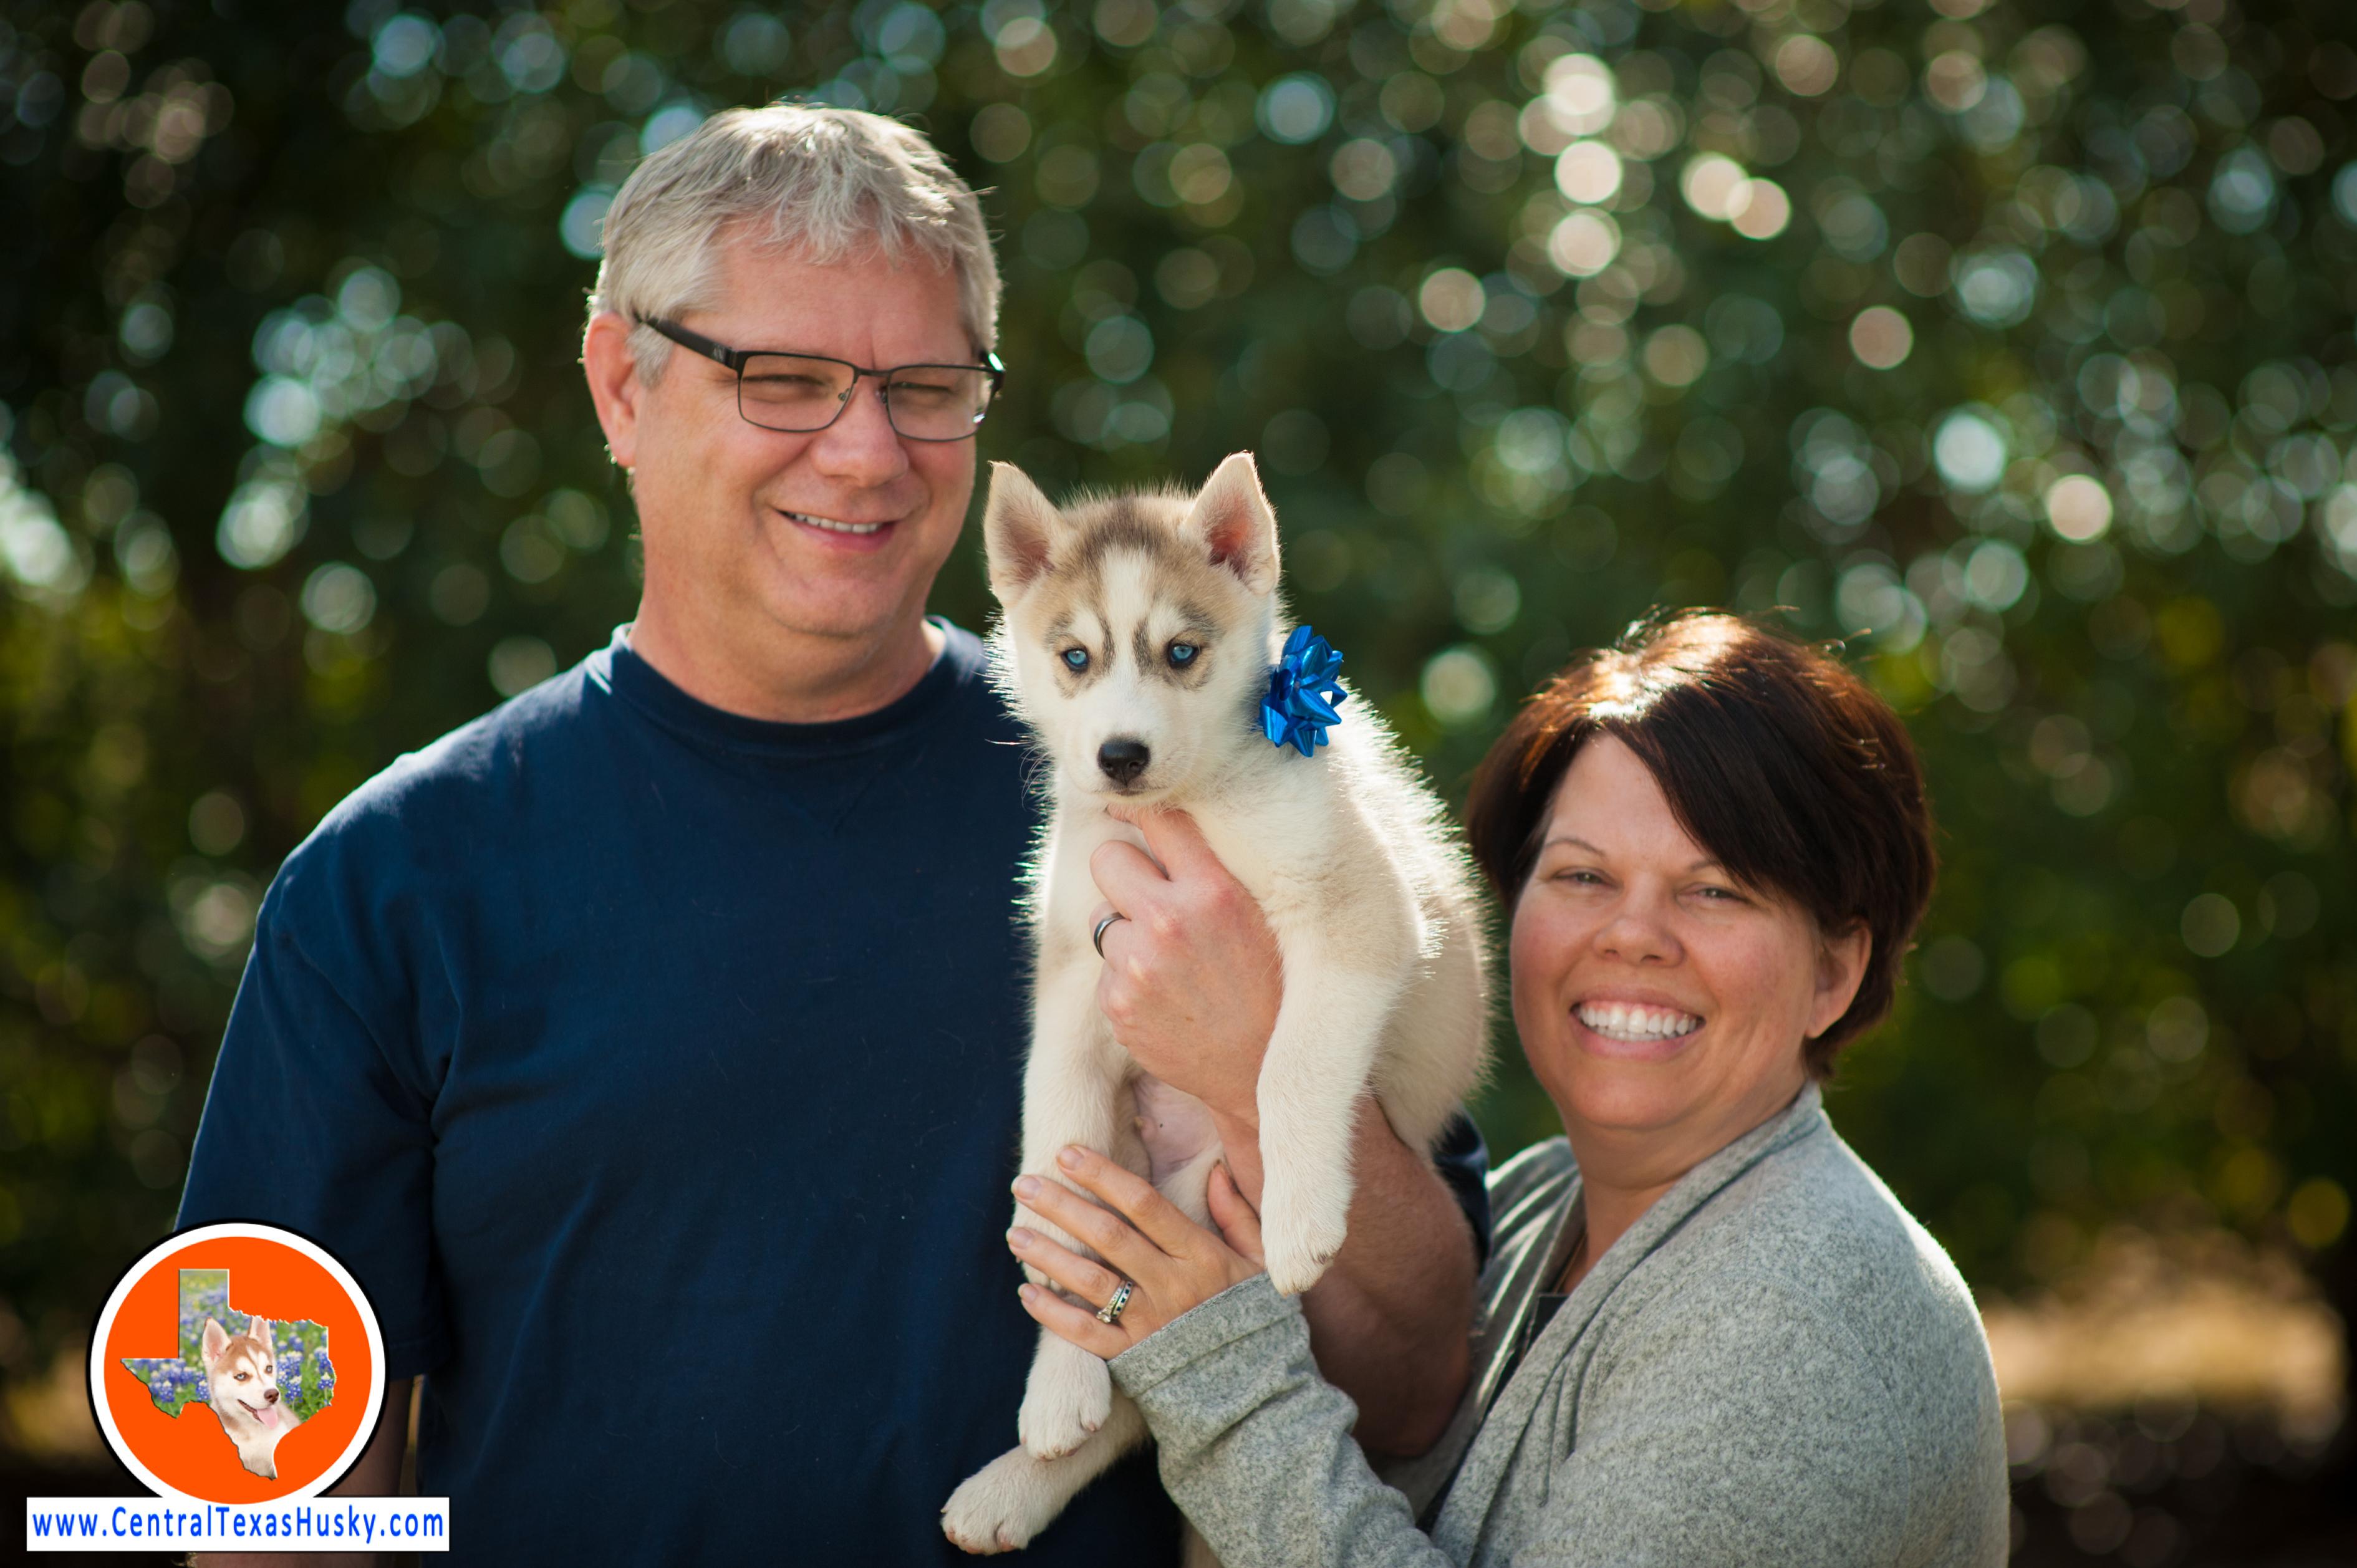 central-texas-husky_austin-siberian-husky-breeder_703152_20171202